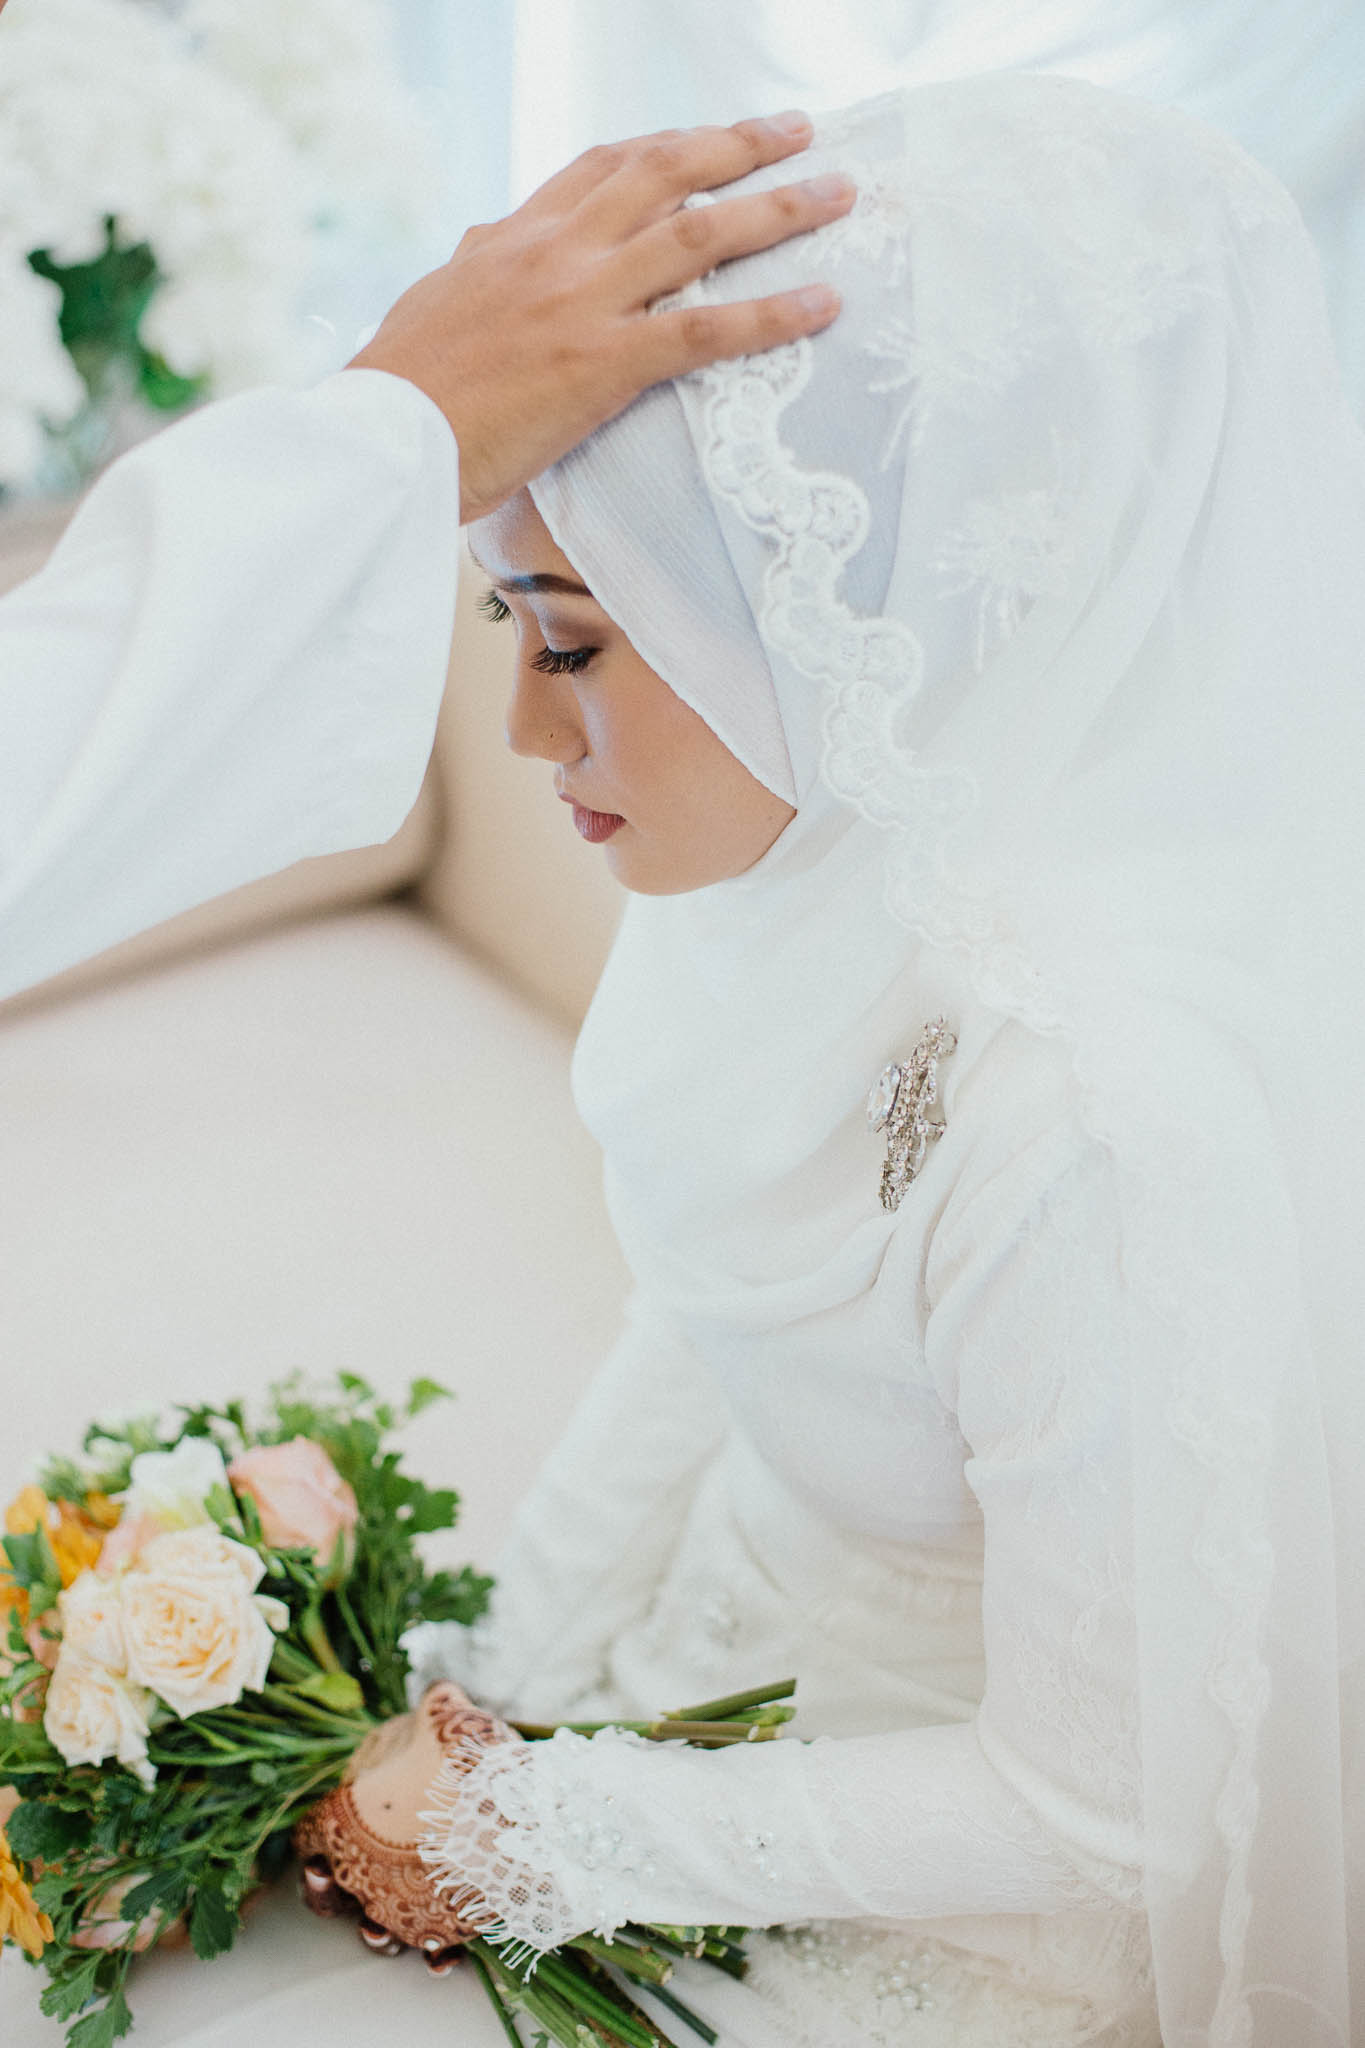 singapore-wedding-photographer-addafiq-nufail-025.jpg